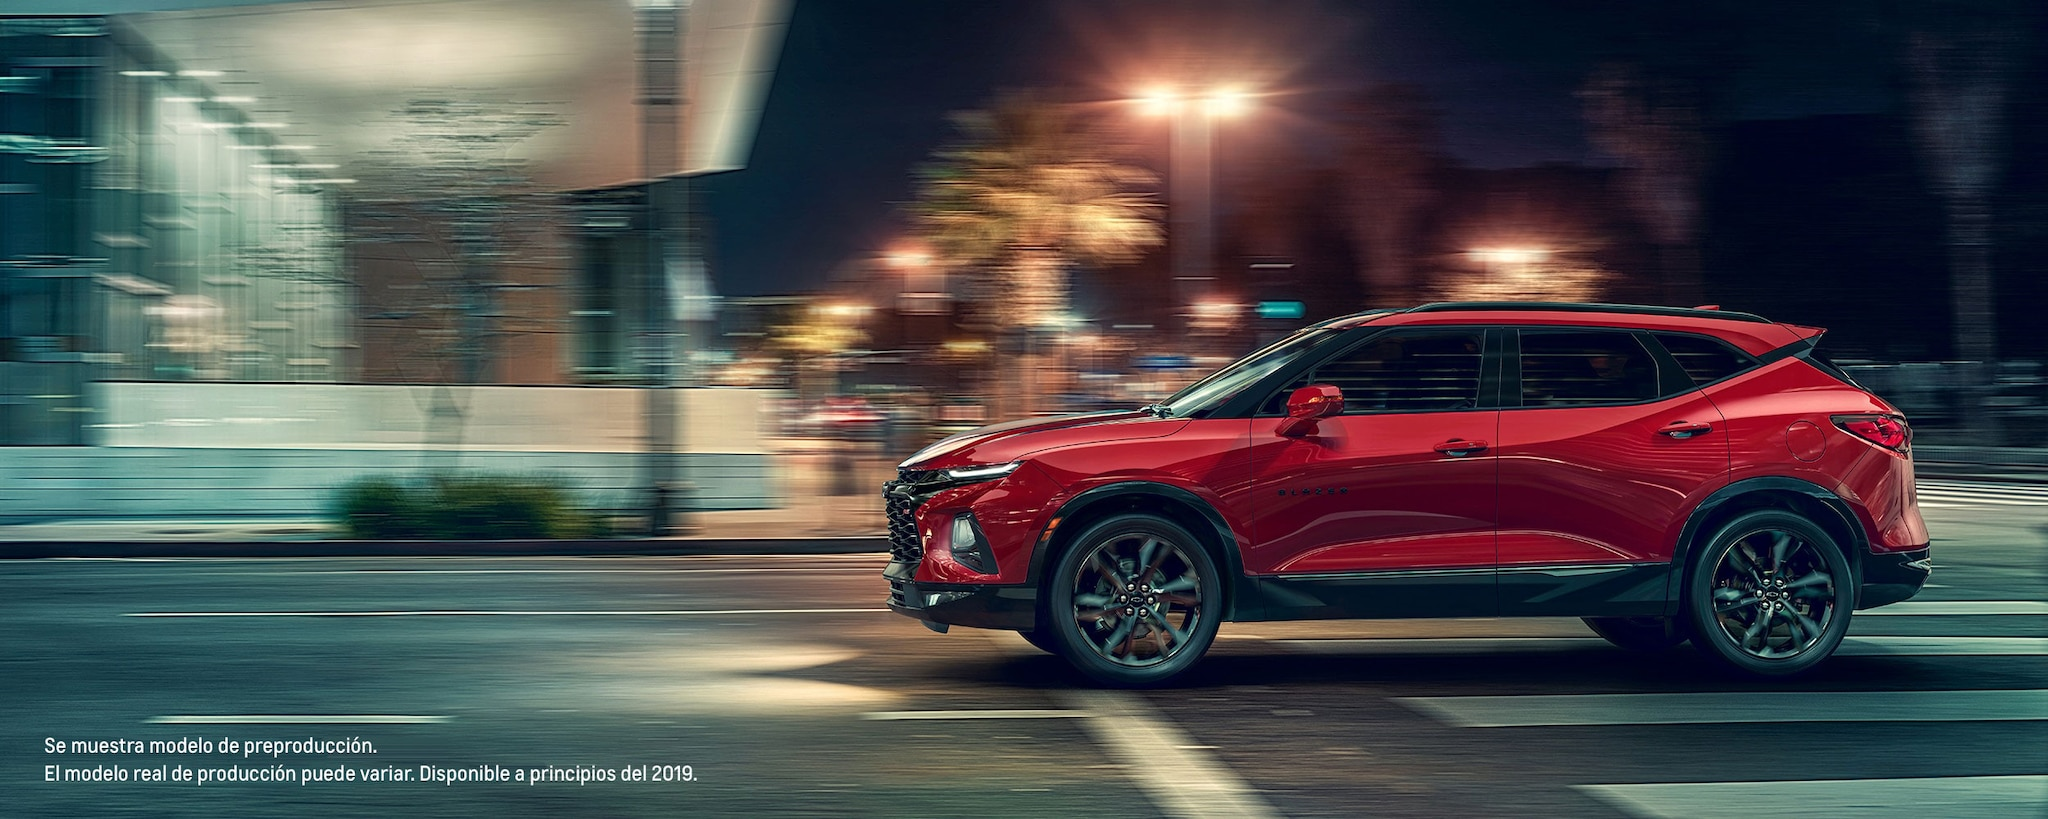 Chevy Blazer 2019 totalmente nueva: SUV deportiva